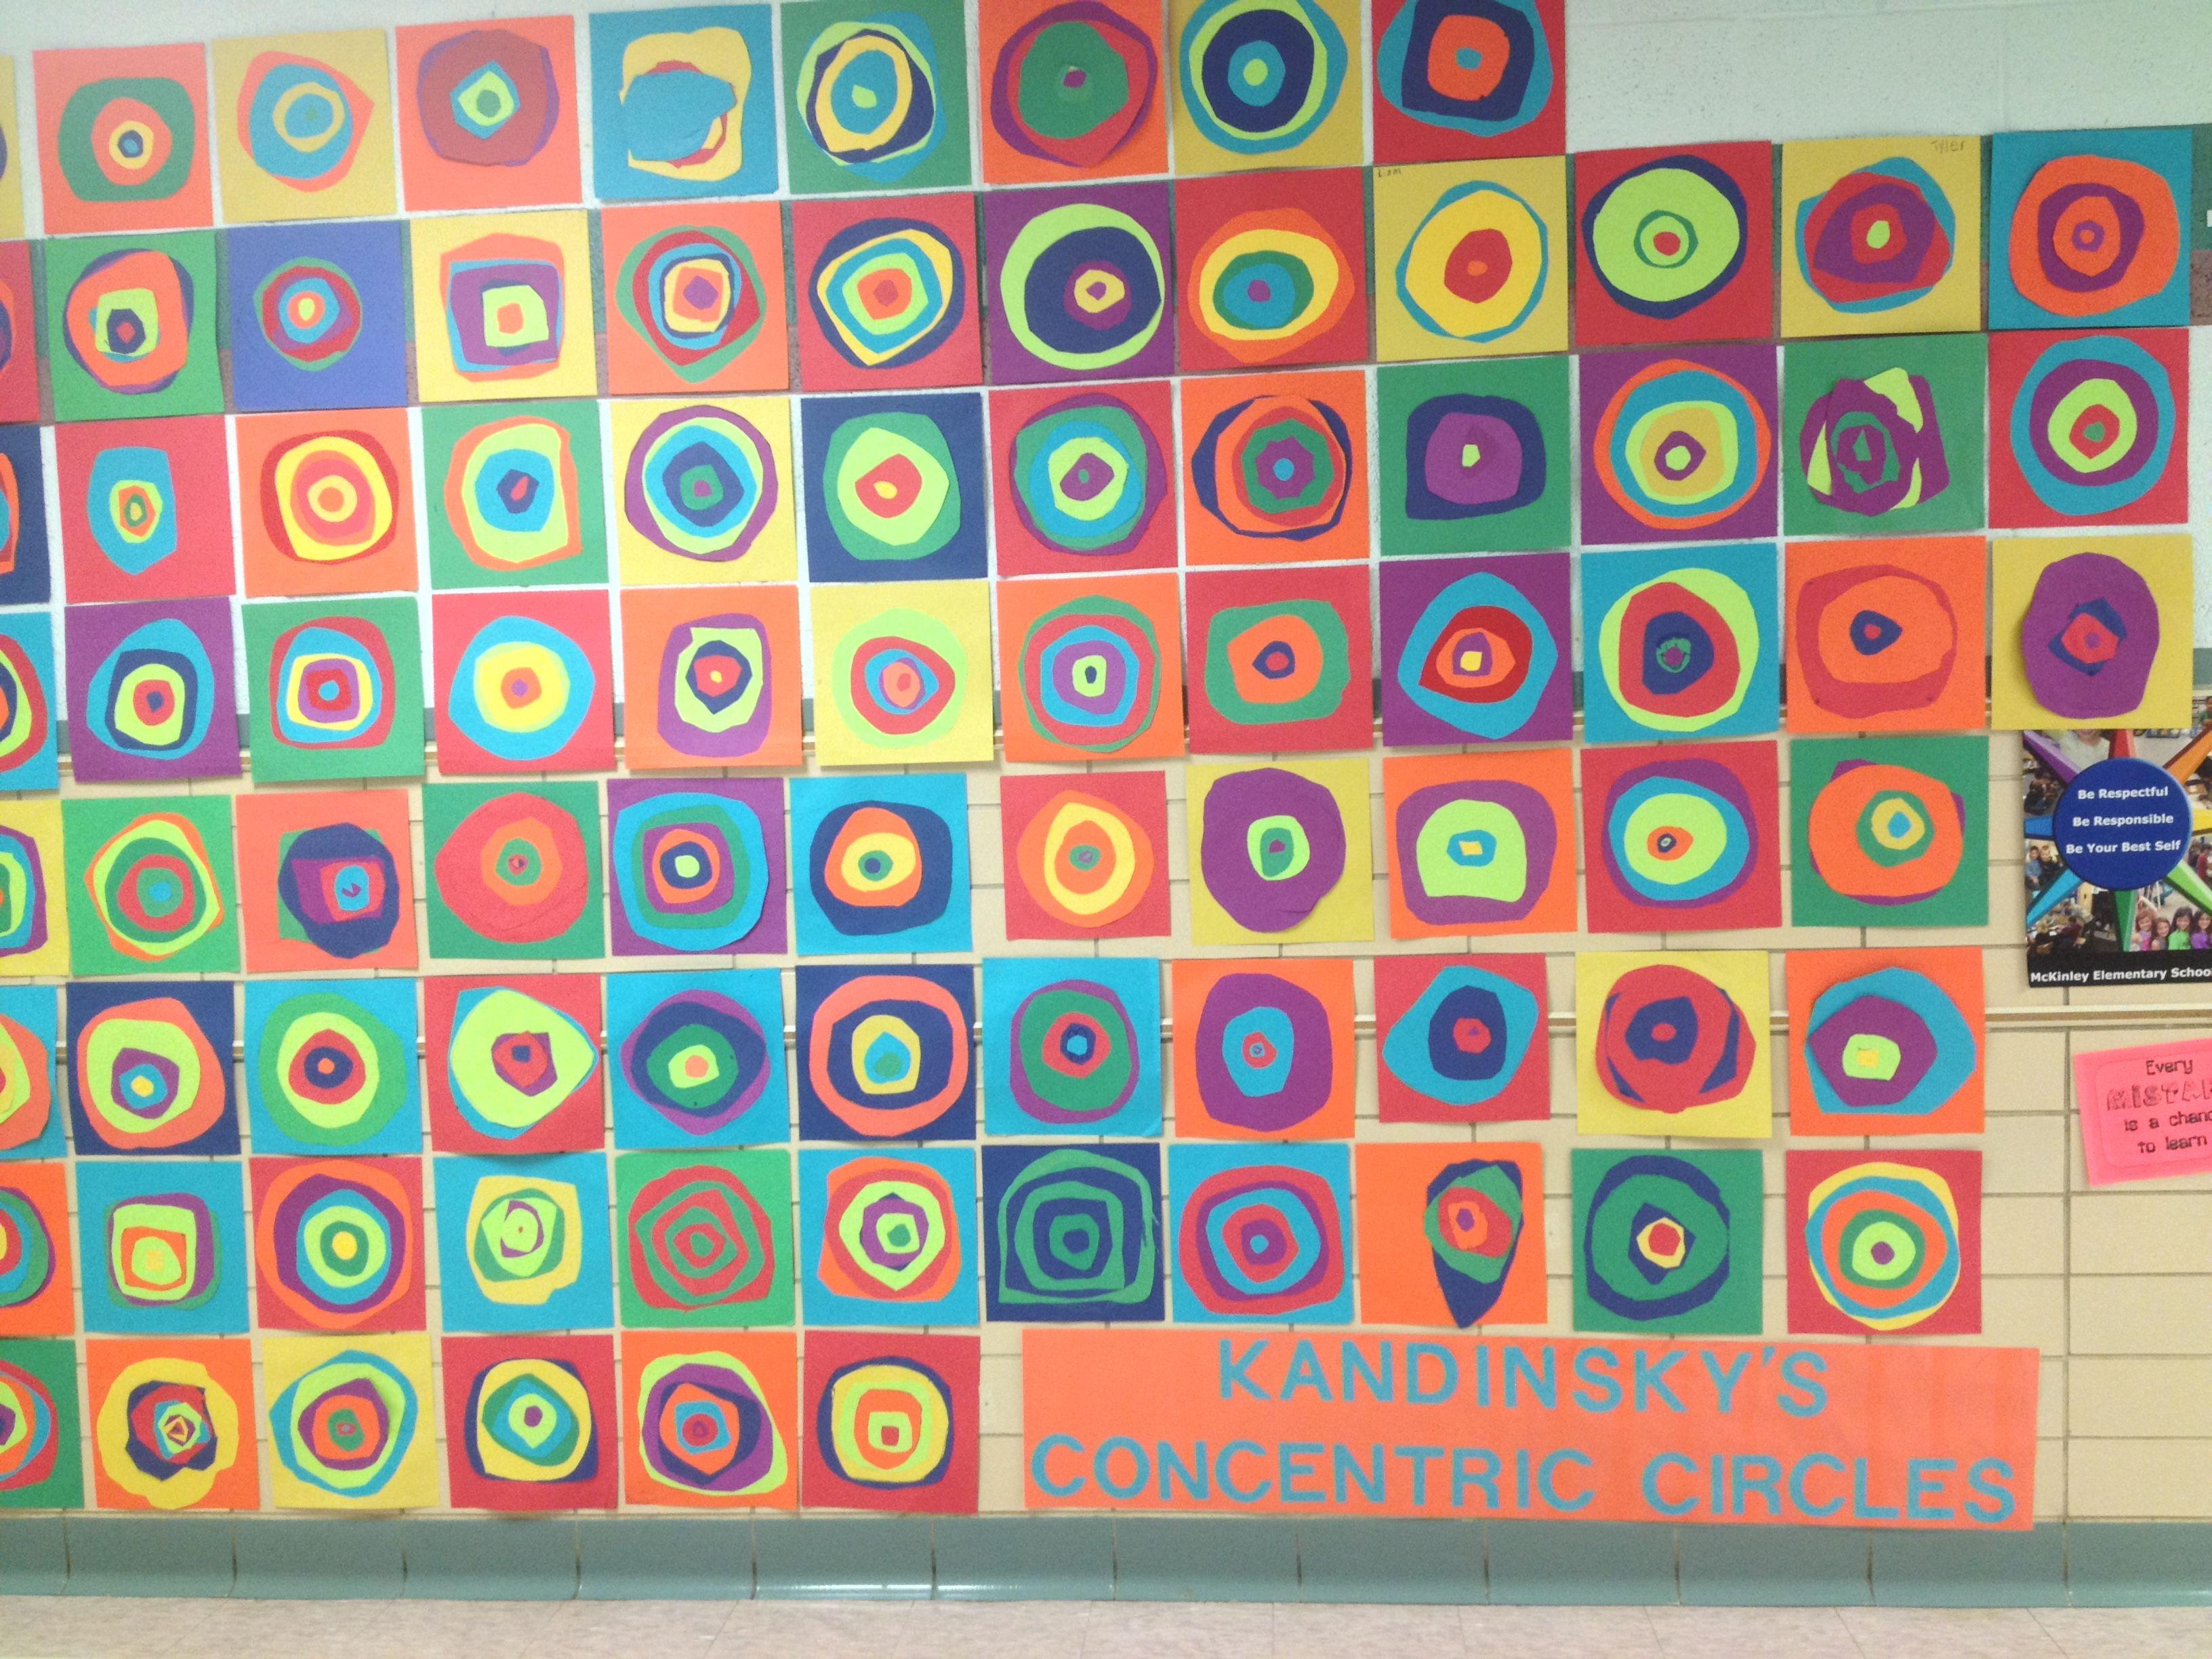 Kandinsky S Concentric Circles Elementary Art Grades 2